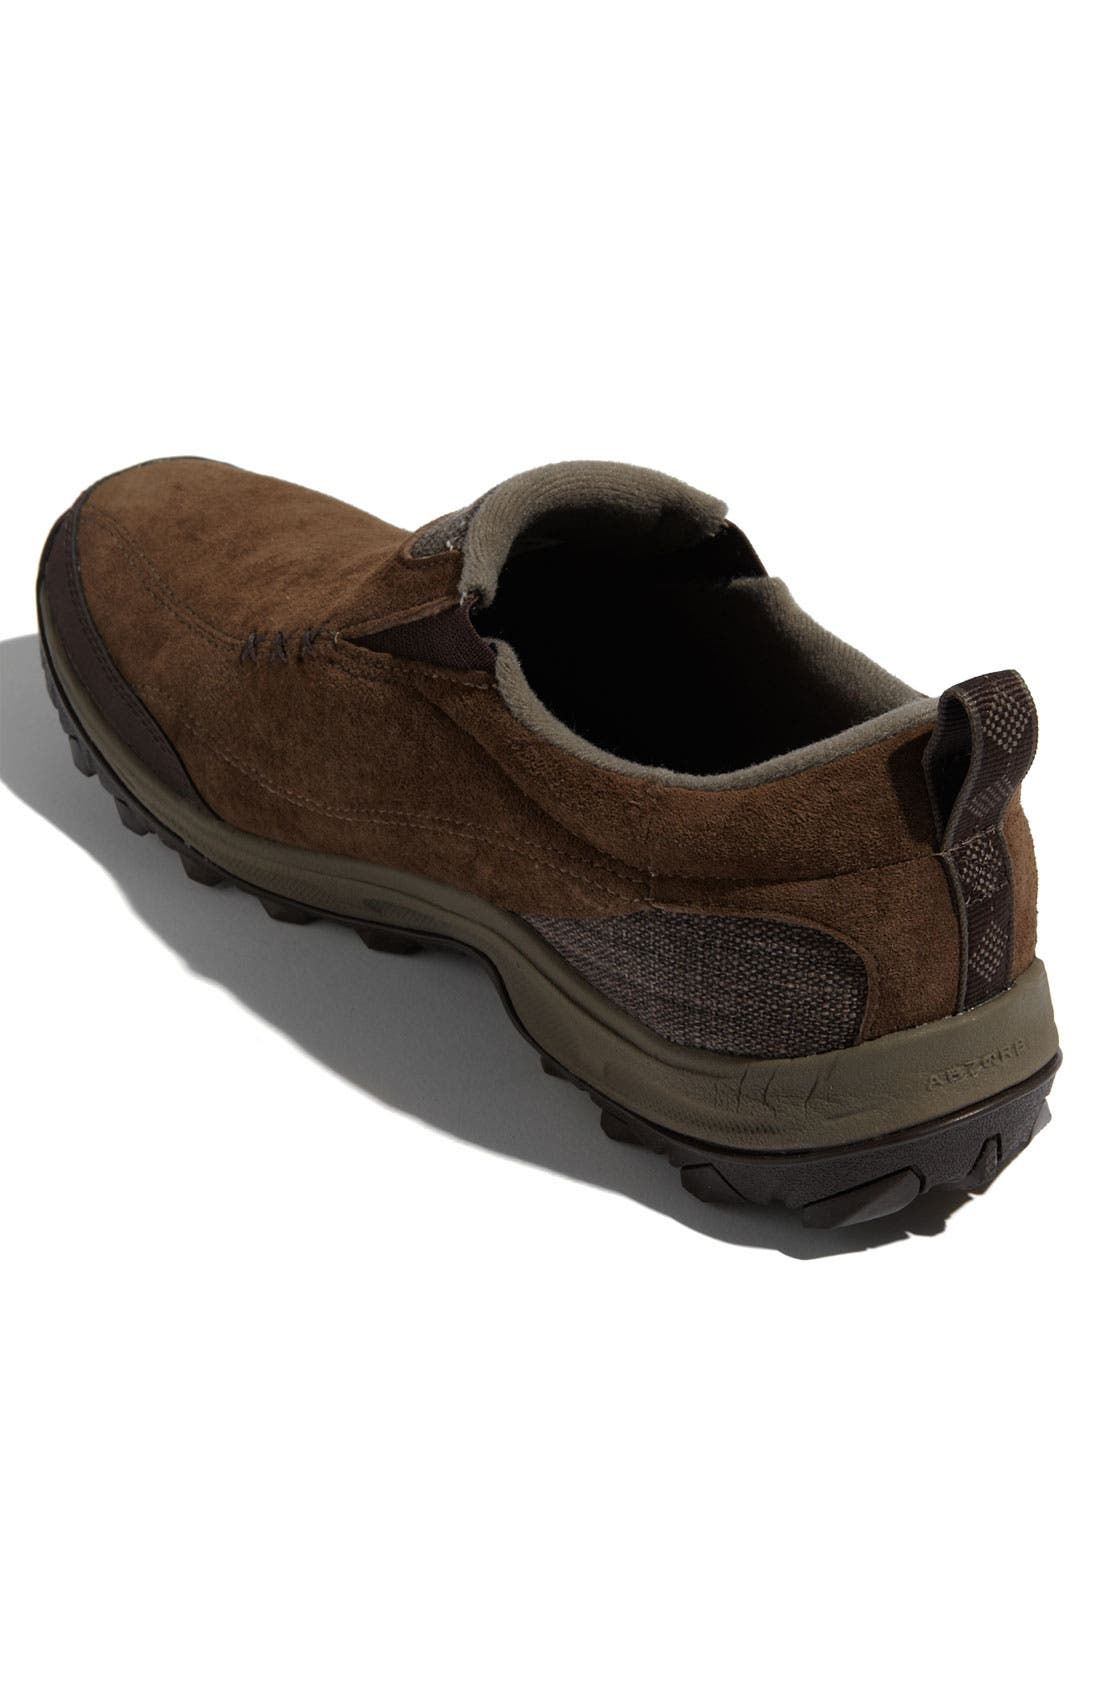 Alternate Image 2  - New Balance '756' Walking Shoe (Men) (Online Only)